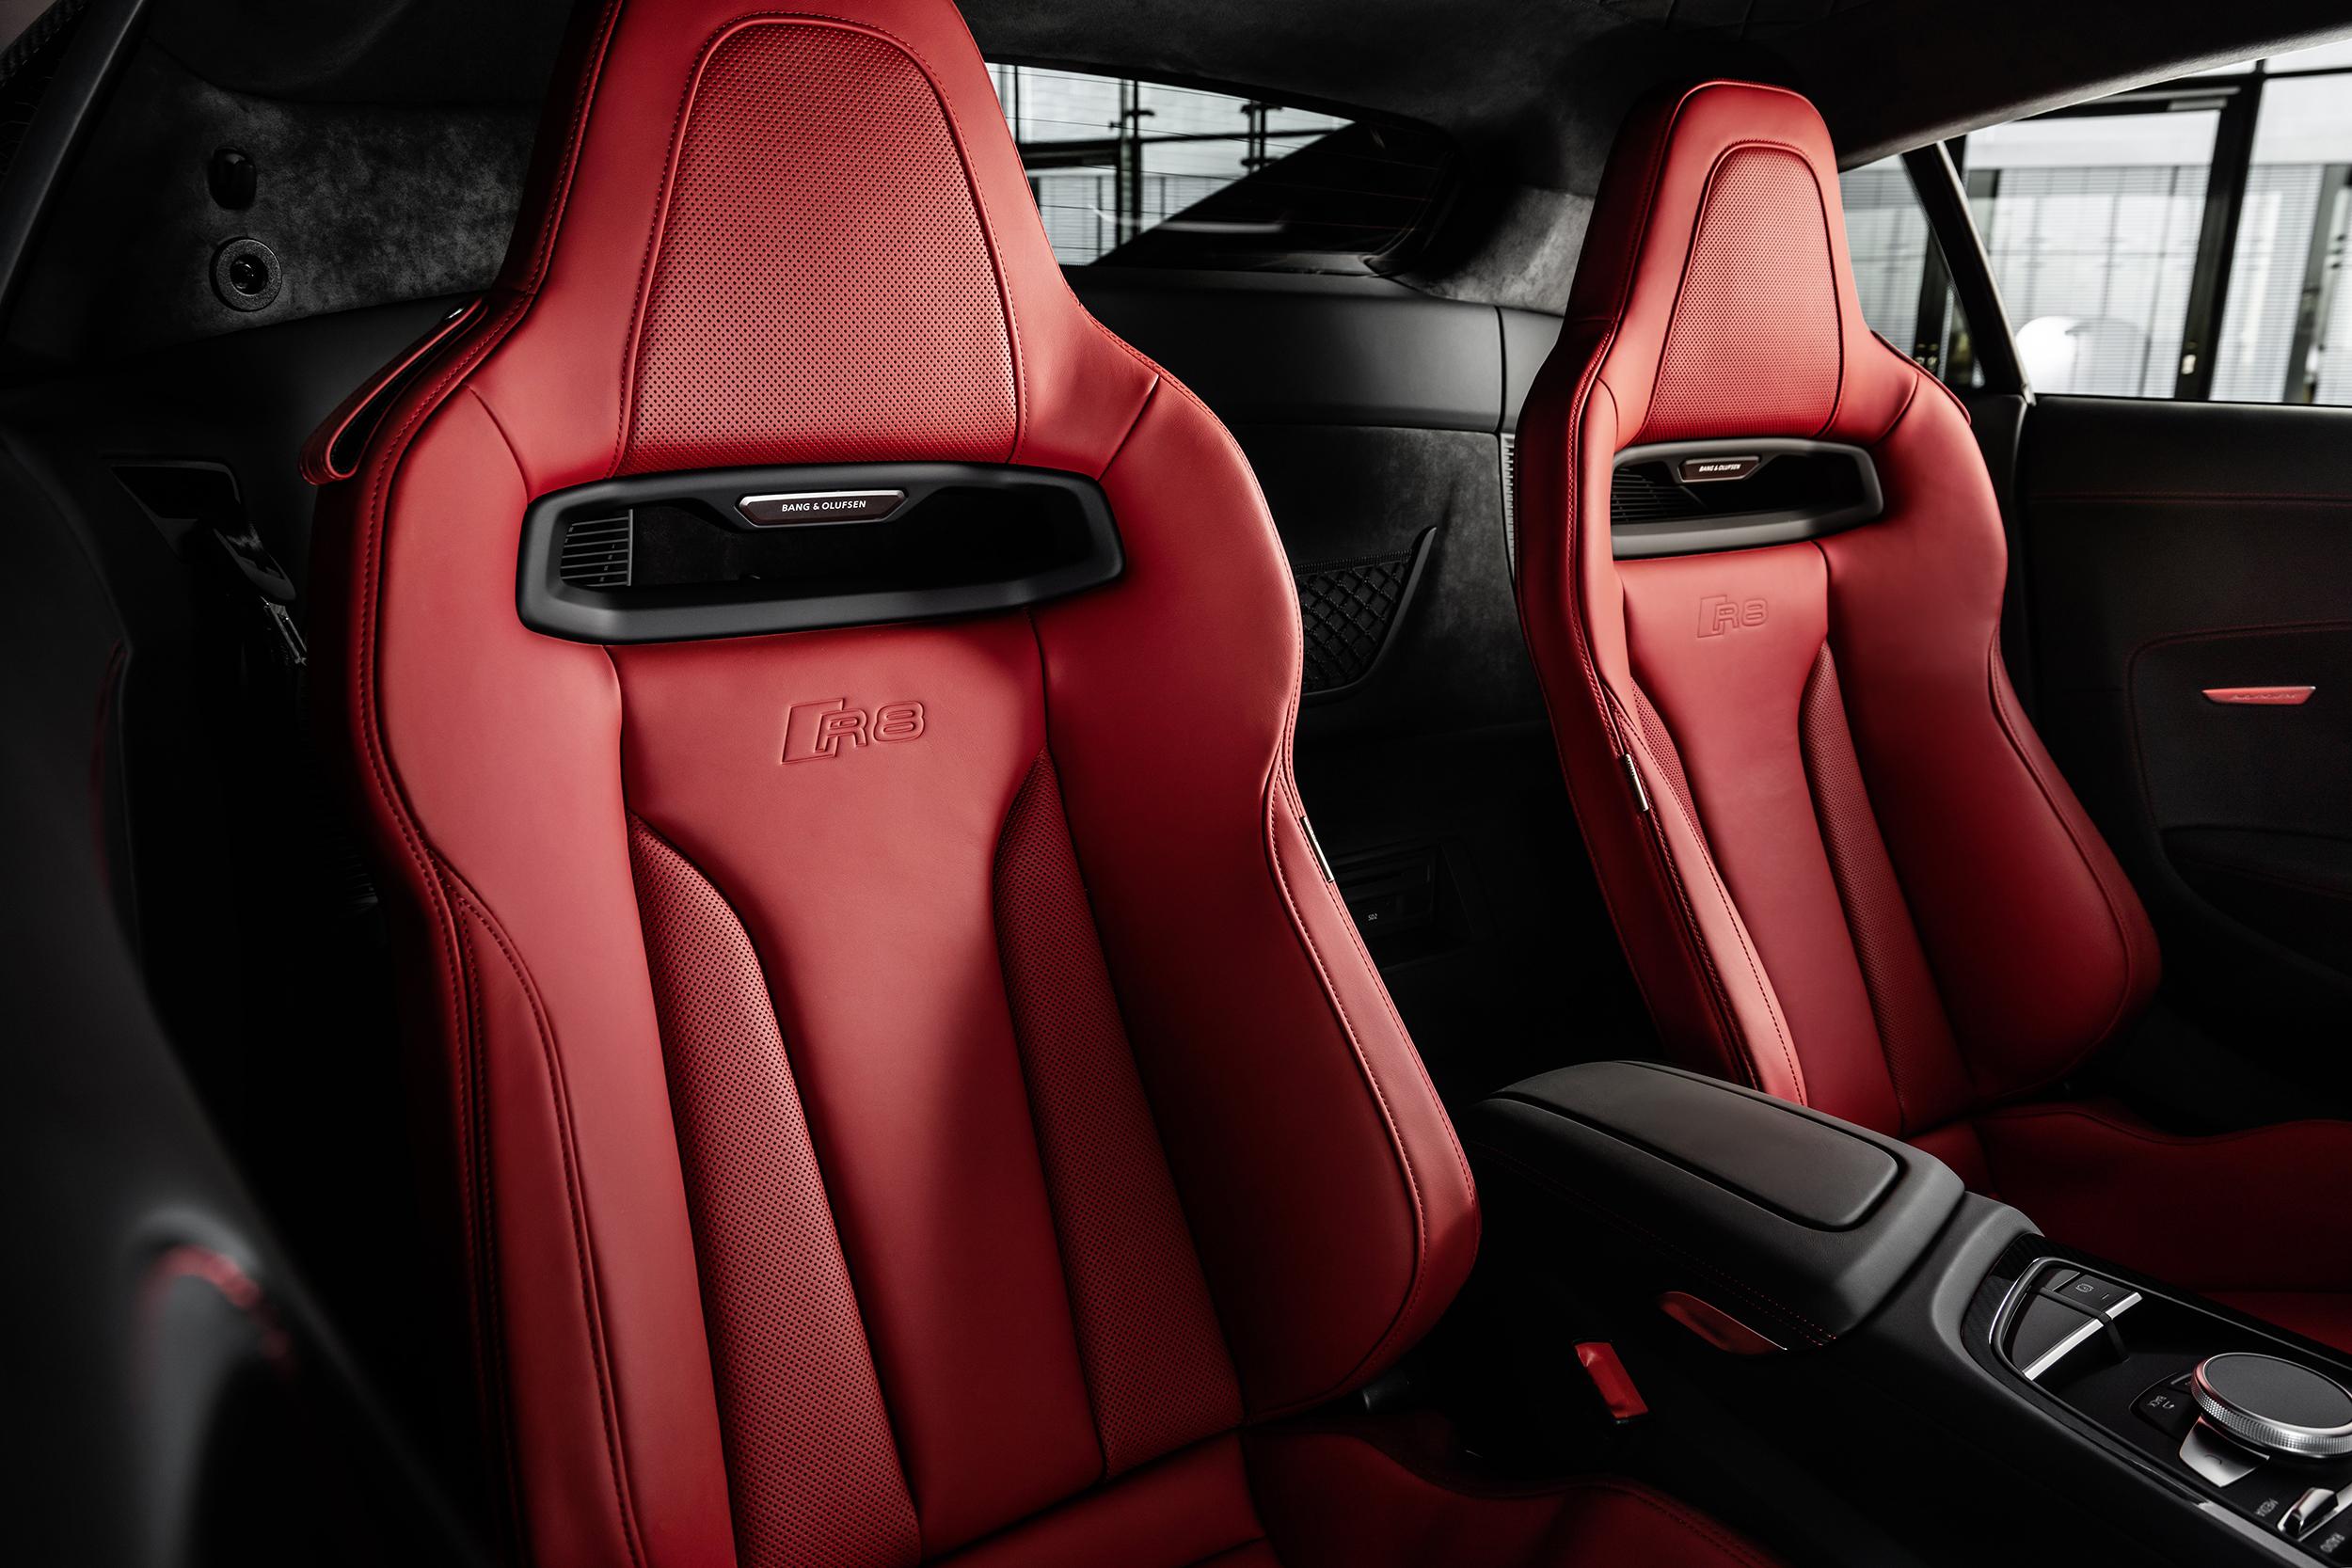 2021 Audi R8 Panther Edition interior